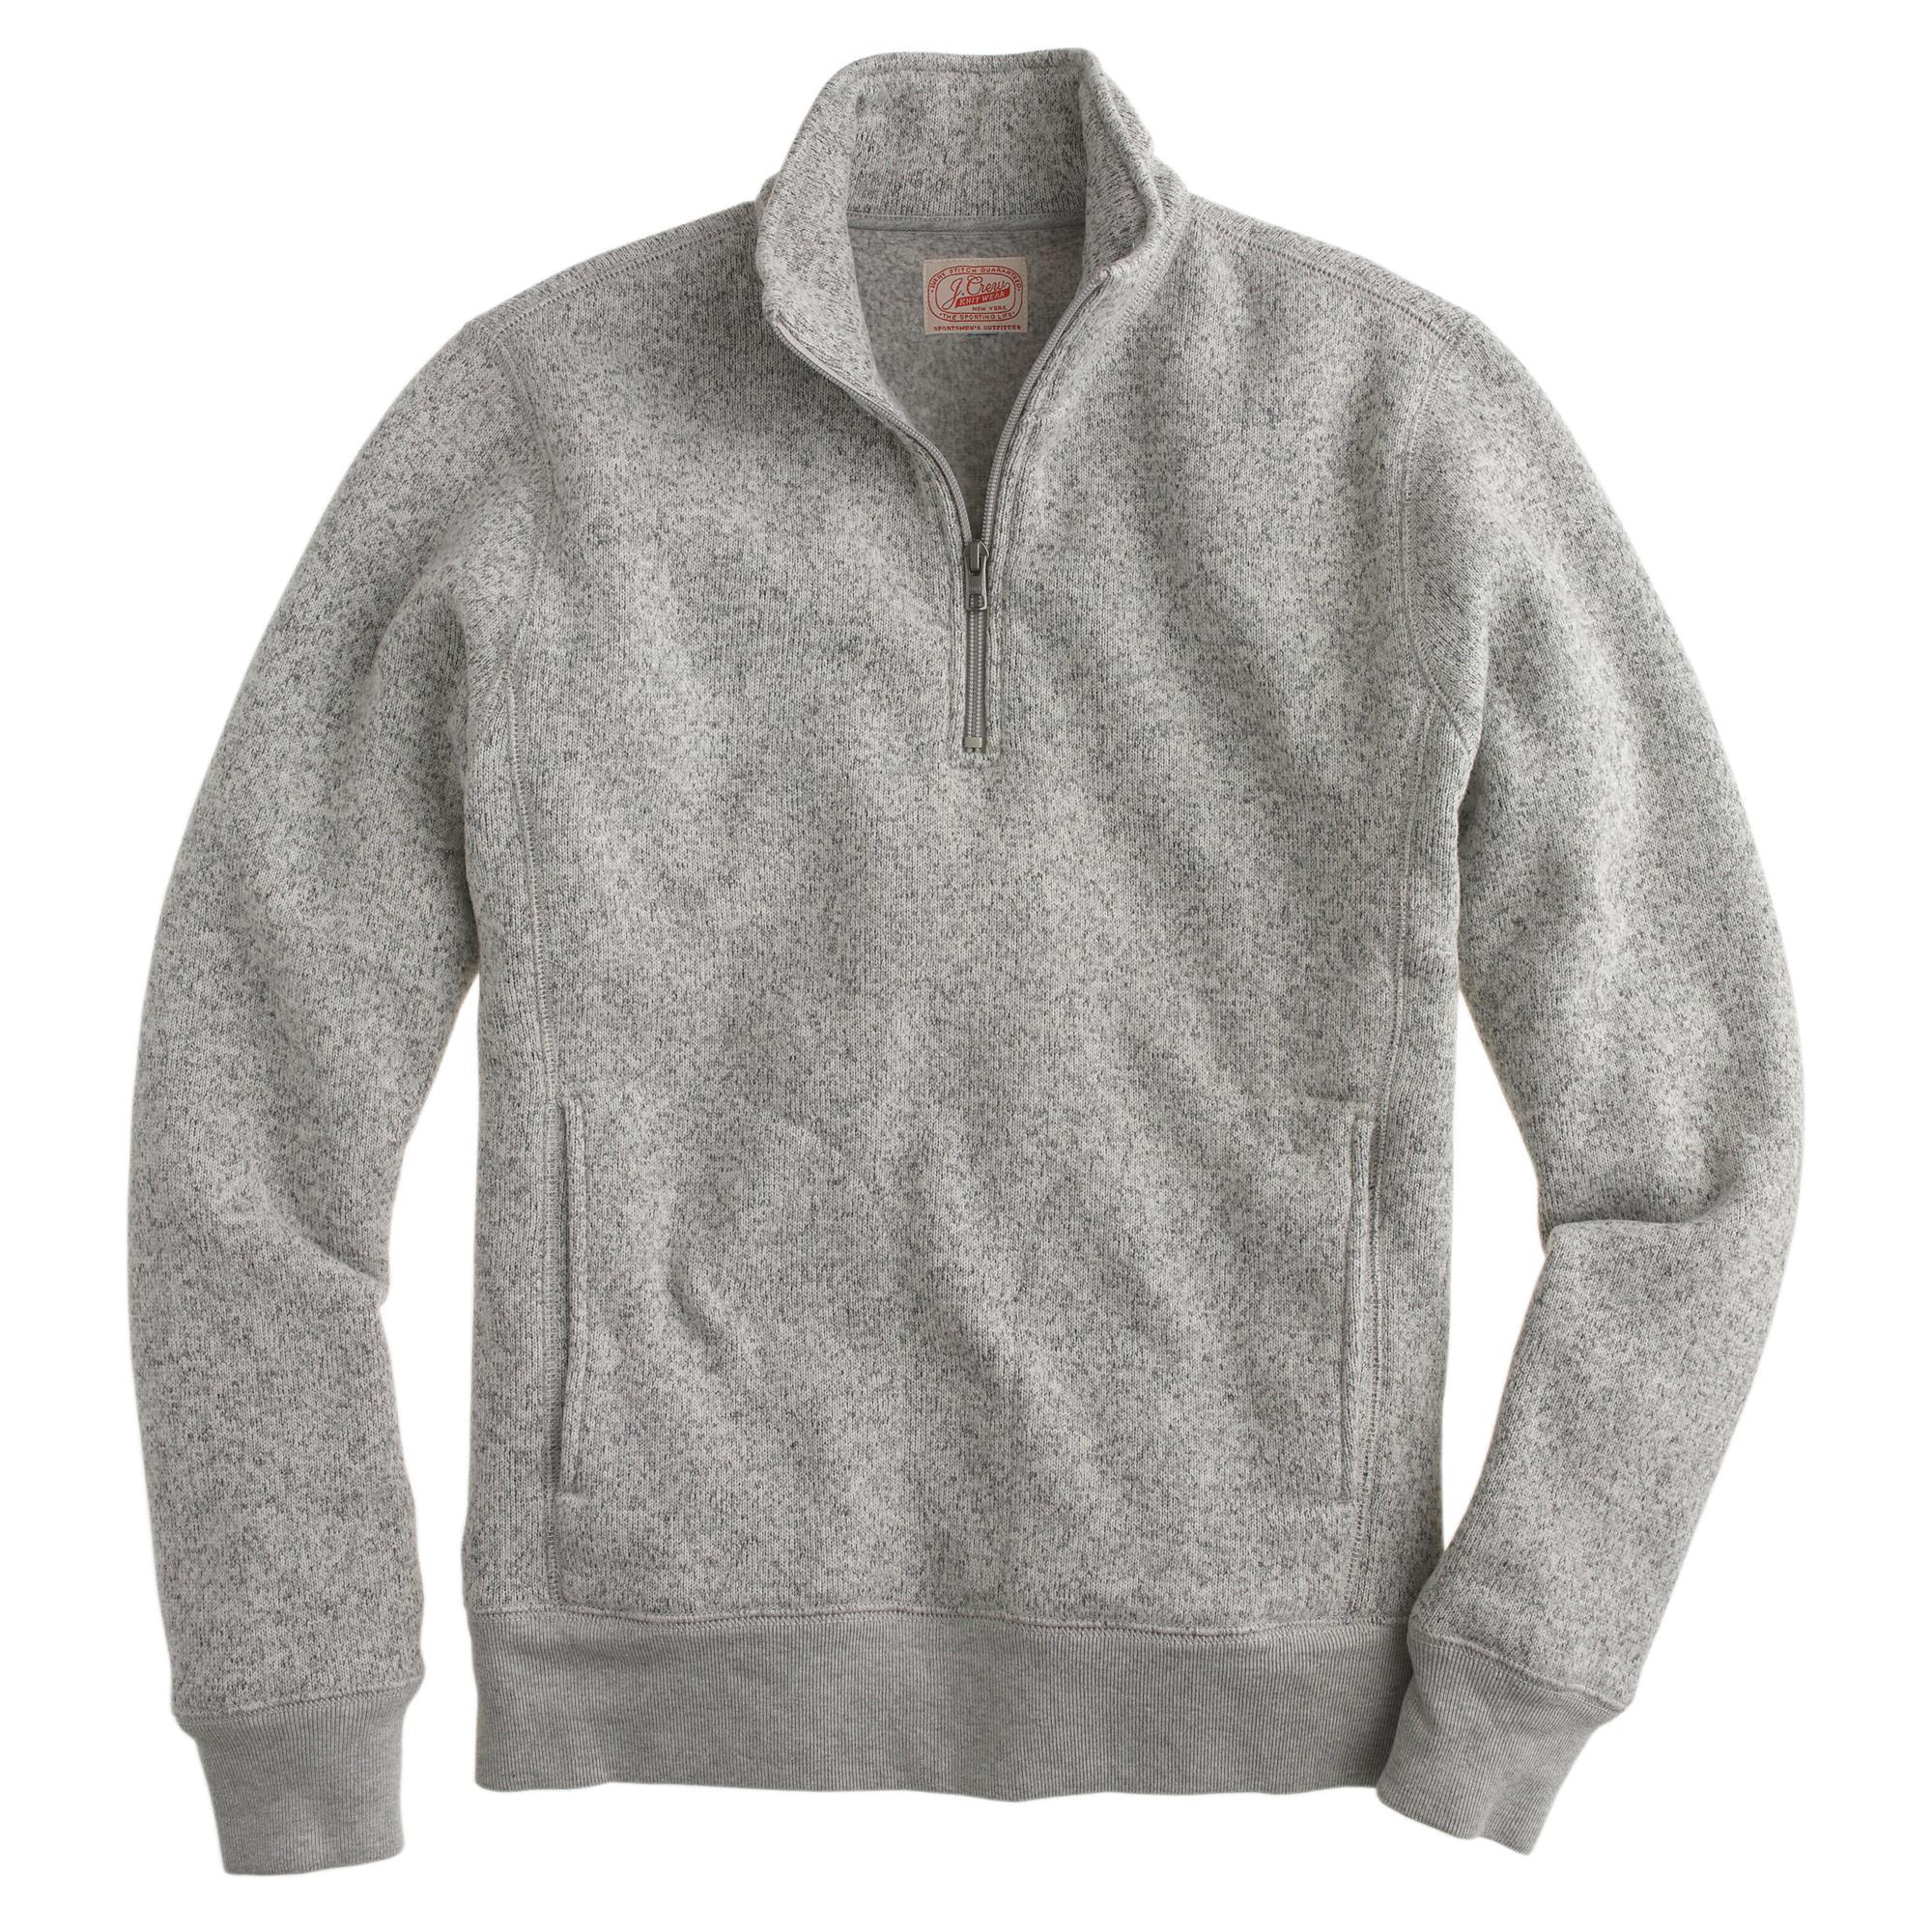 tall summit fleece half zip pullover jacket j crew. Black Bedroom Furniture Sets. Home Design Ideas